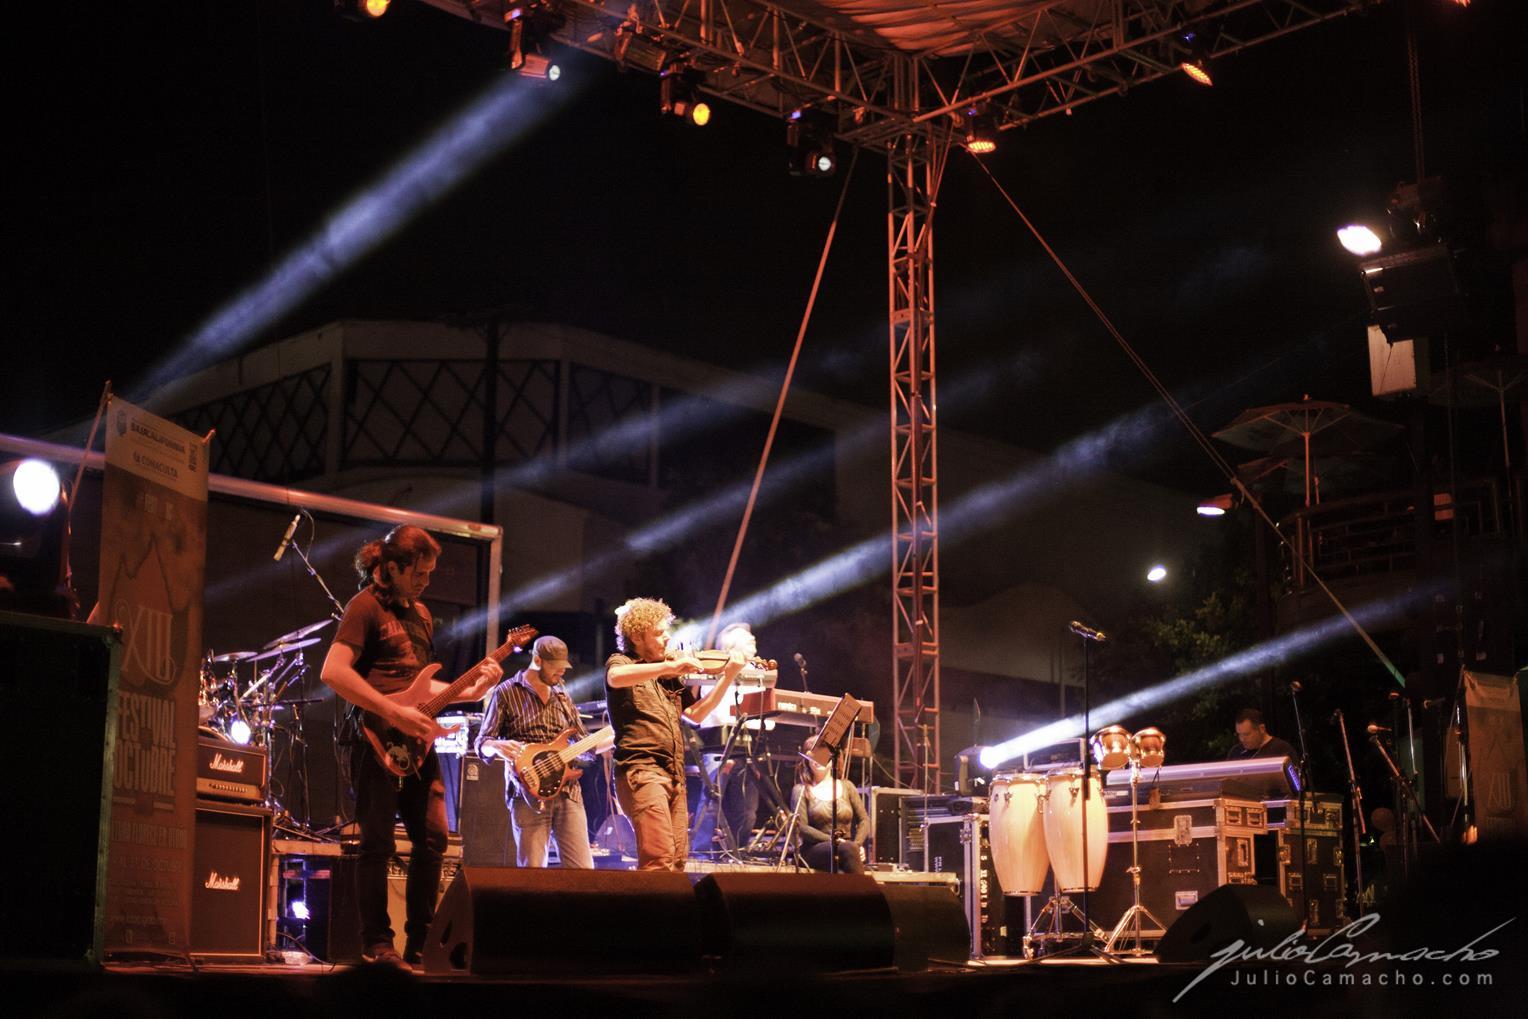 2014-10-30 31 CAST TOUR Ensenada y Tijuana - 1513 - www.Juli (Copy).jpg